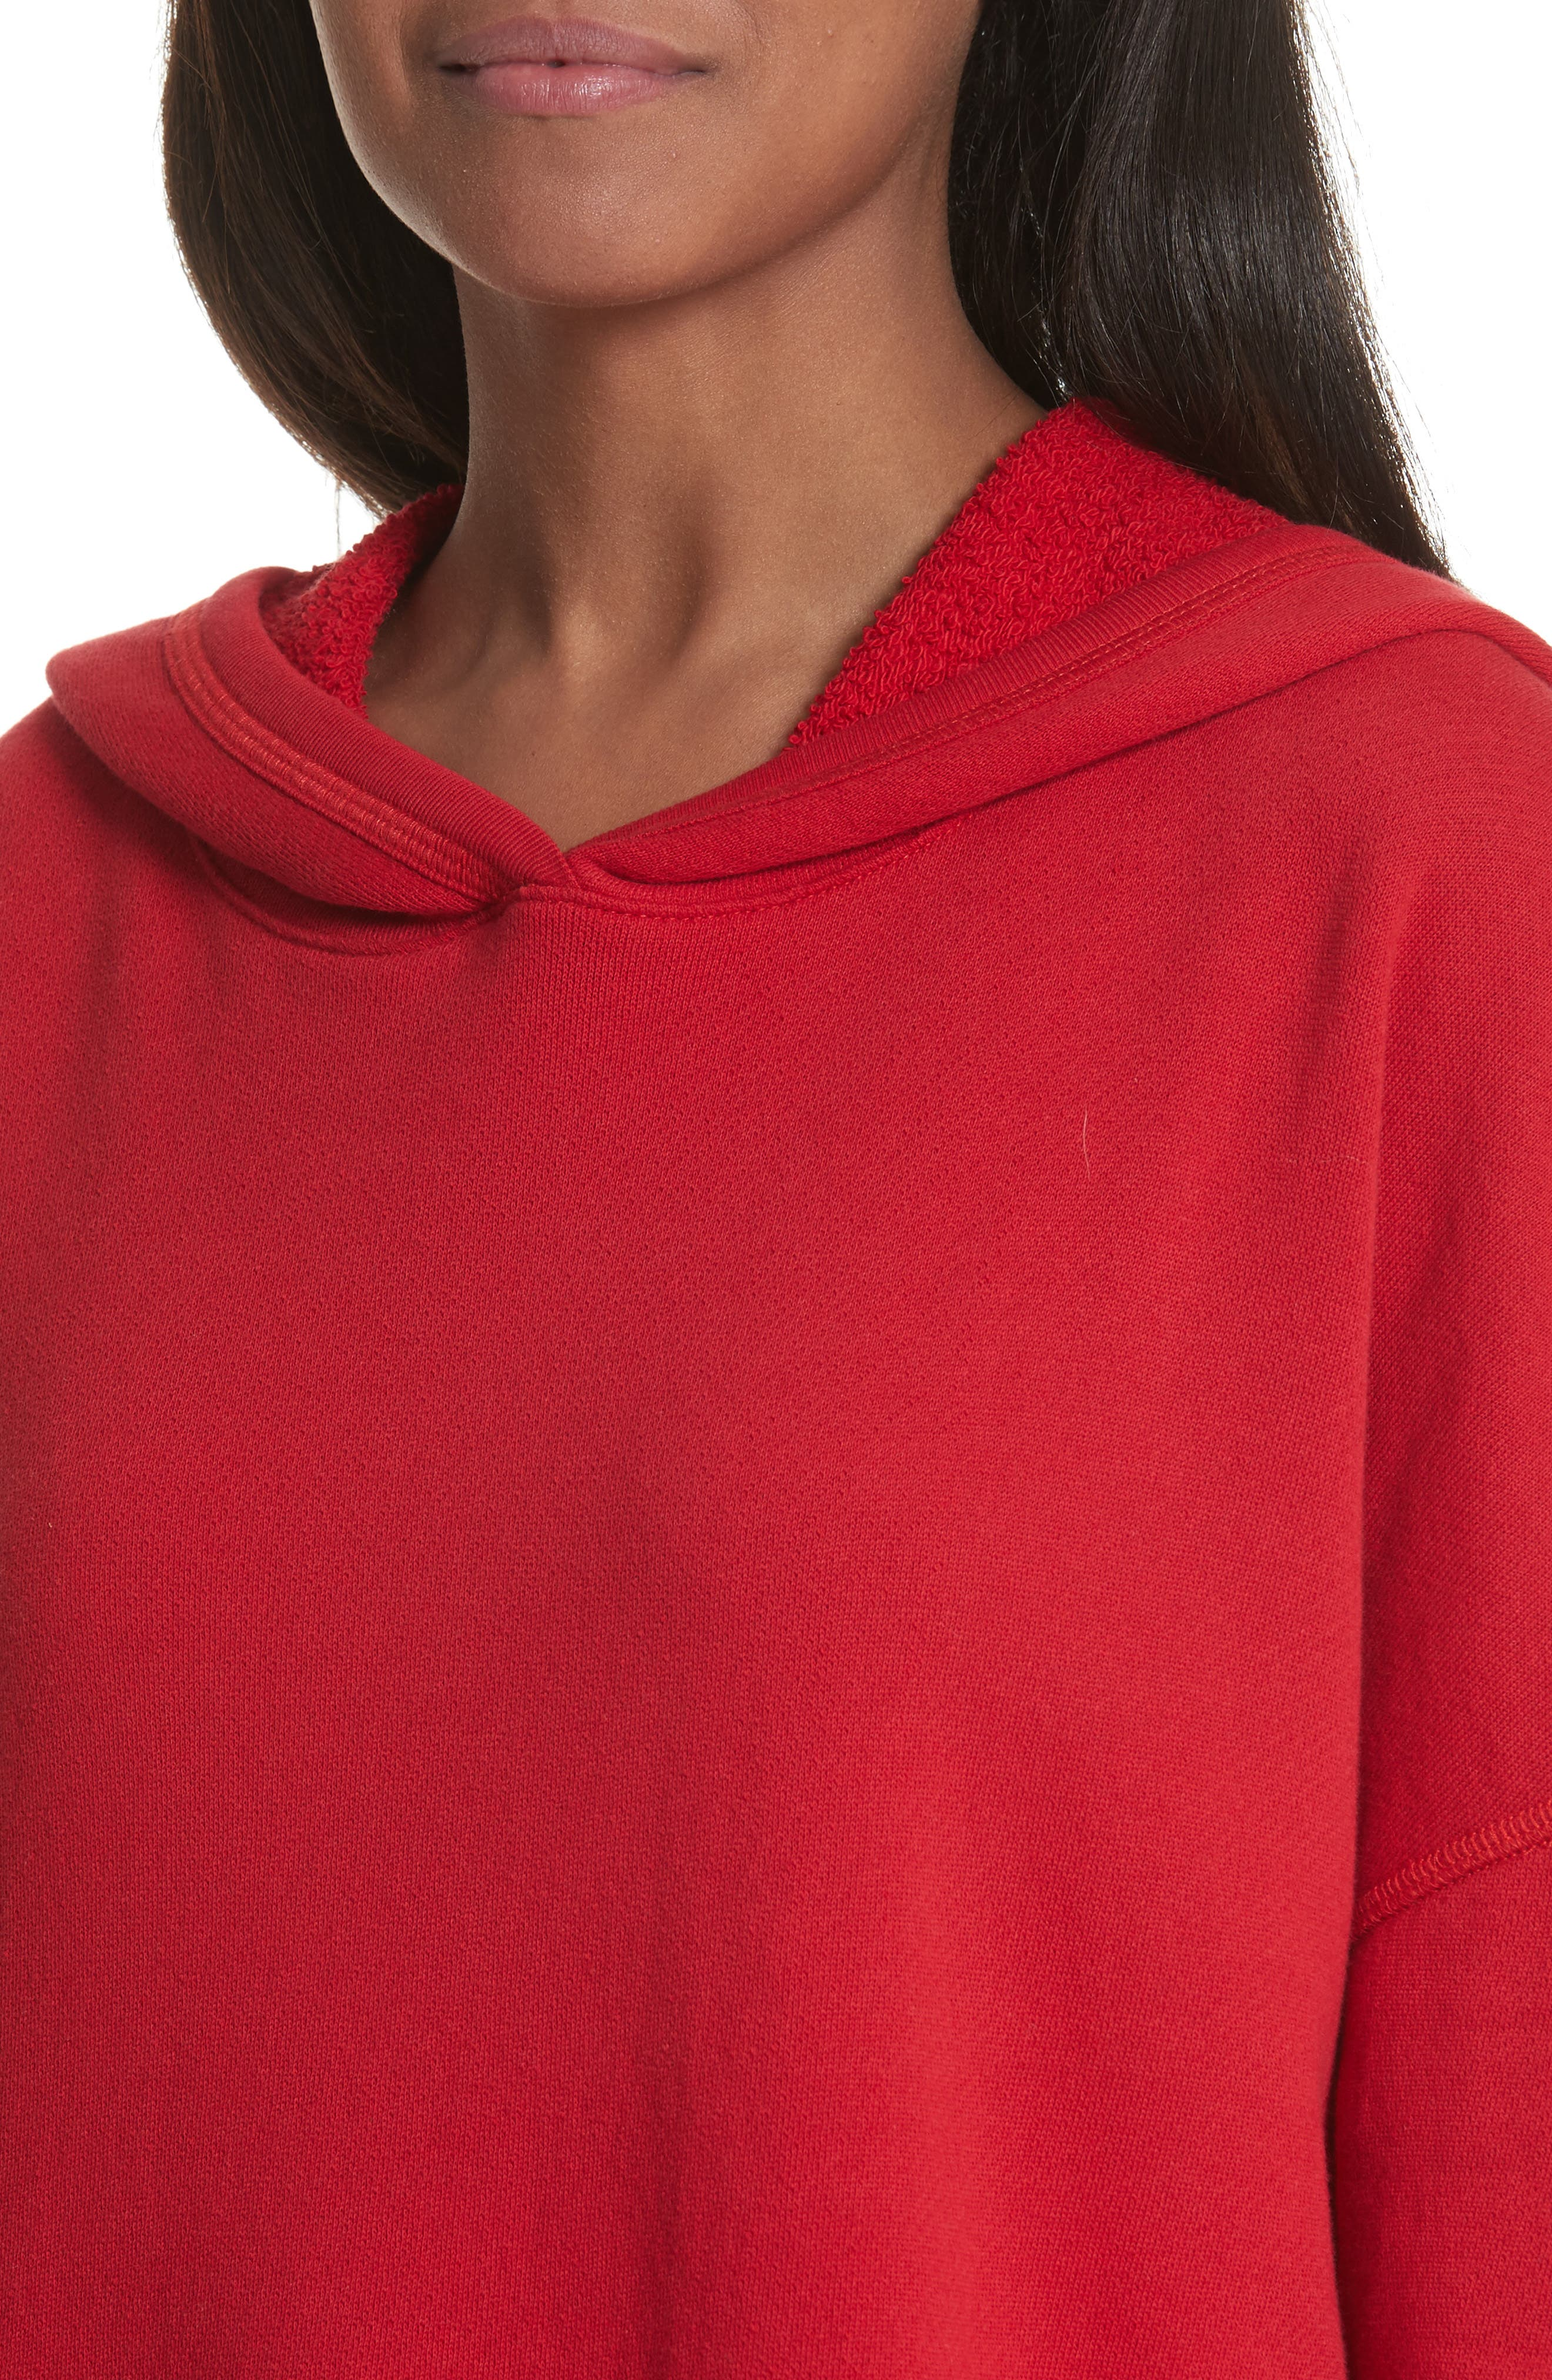 Adene Hooded Sweatshirt,                             Alternate thumbnail 4, color,                             Matador Red